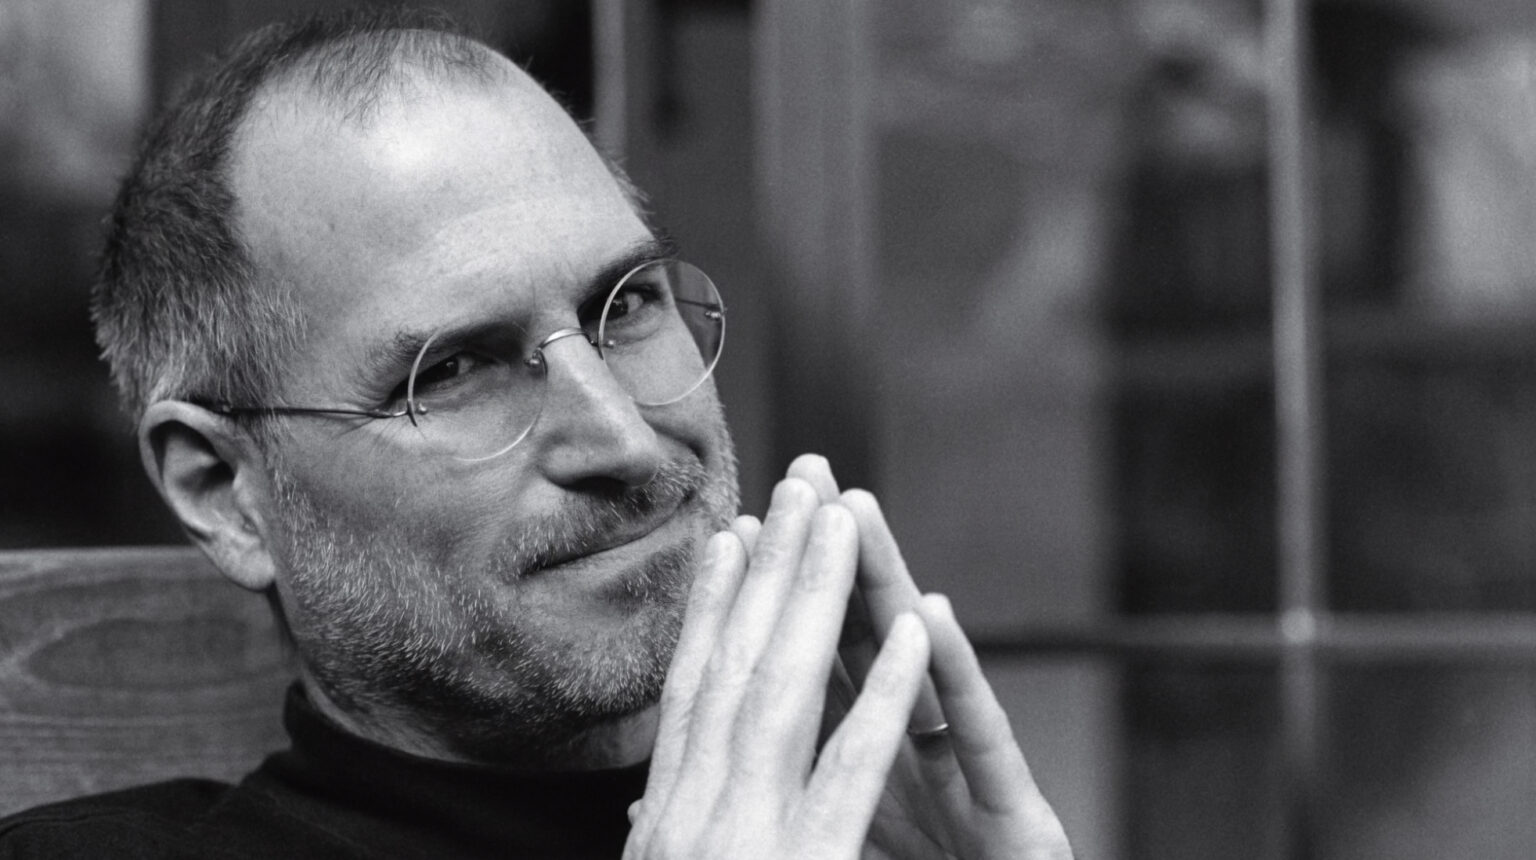 Apple celebrates Steve Jobs